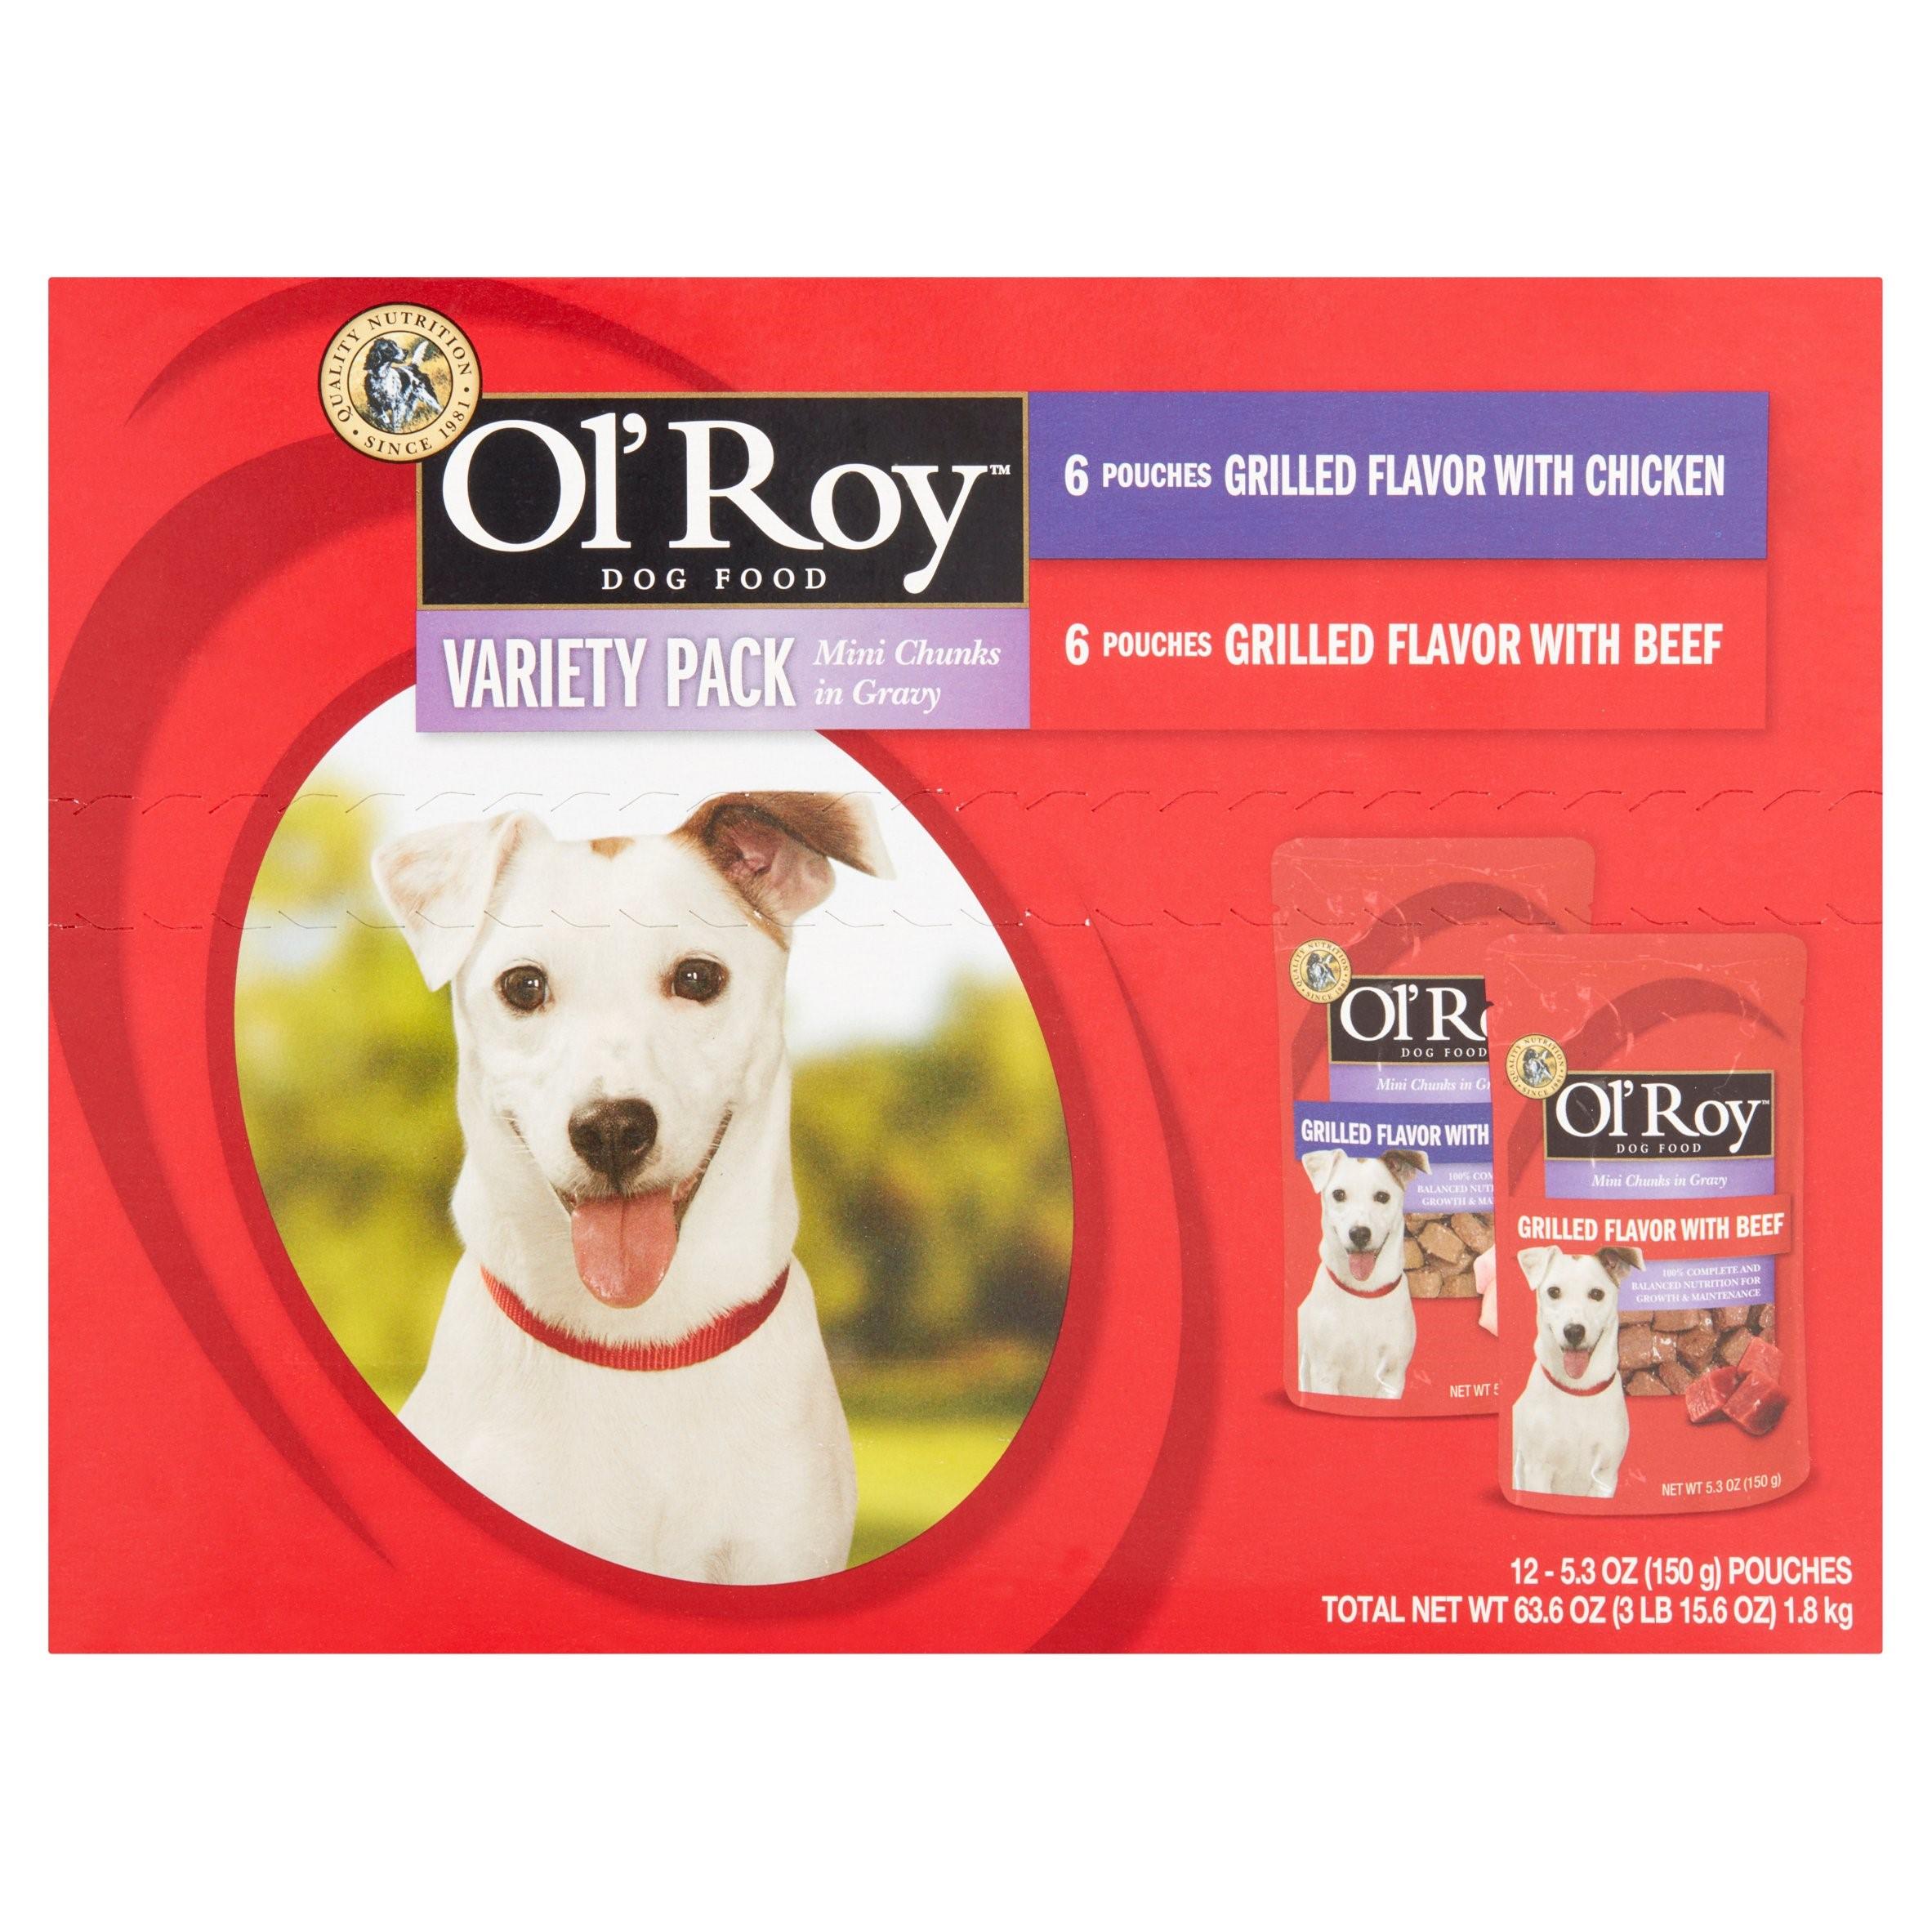 Ol' Roy Variety Pack Mini Chunks in Gravy Wet Dog Food, 5.3 oz, 12 ct